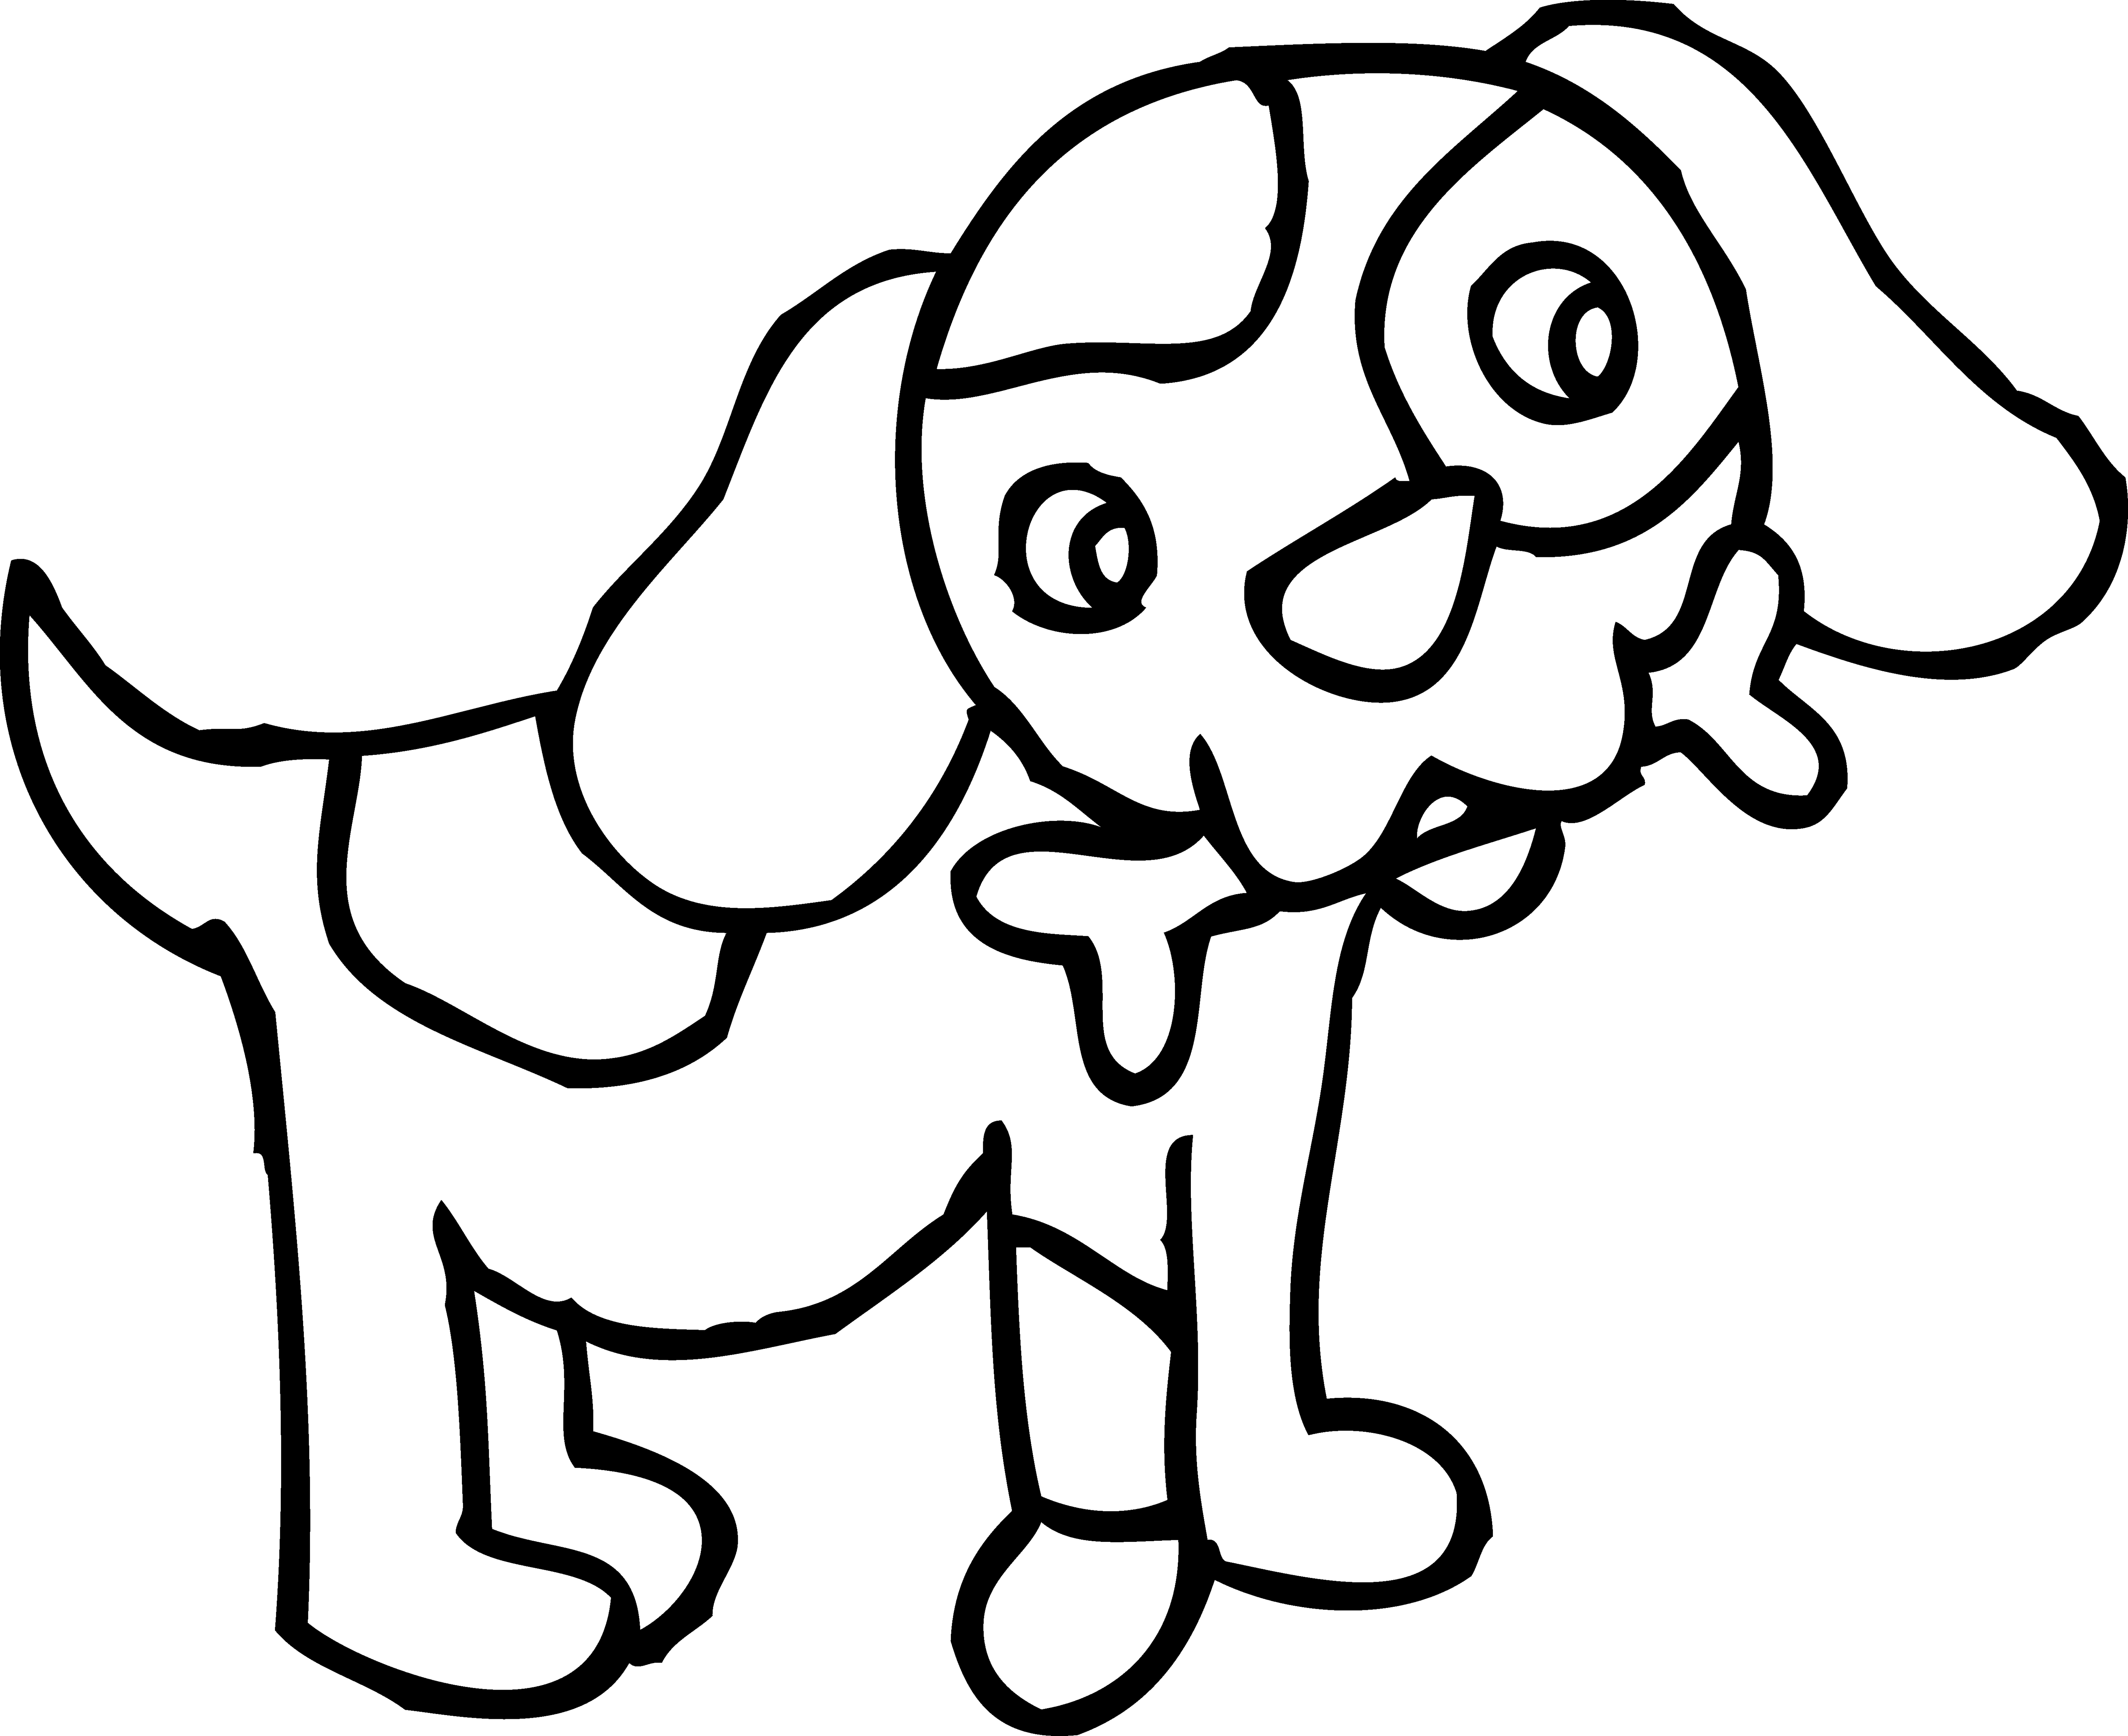 Dog For Kids Drawing | Free download best Dog For Kids